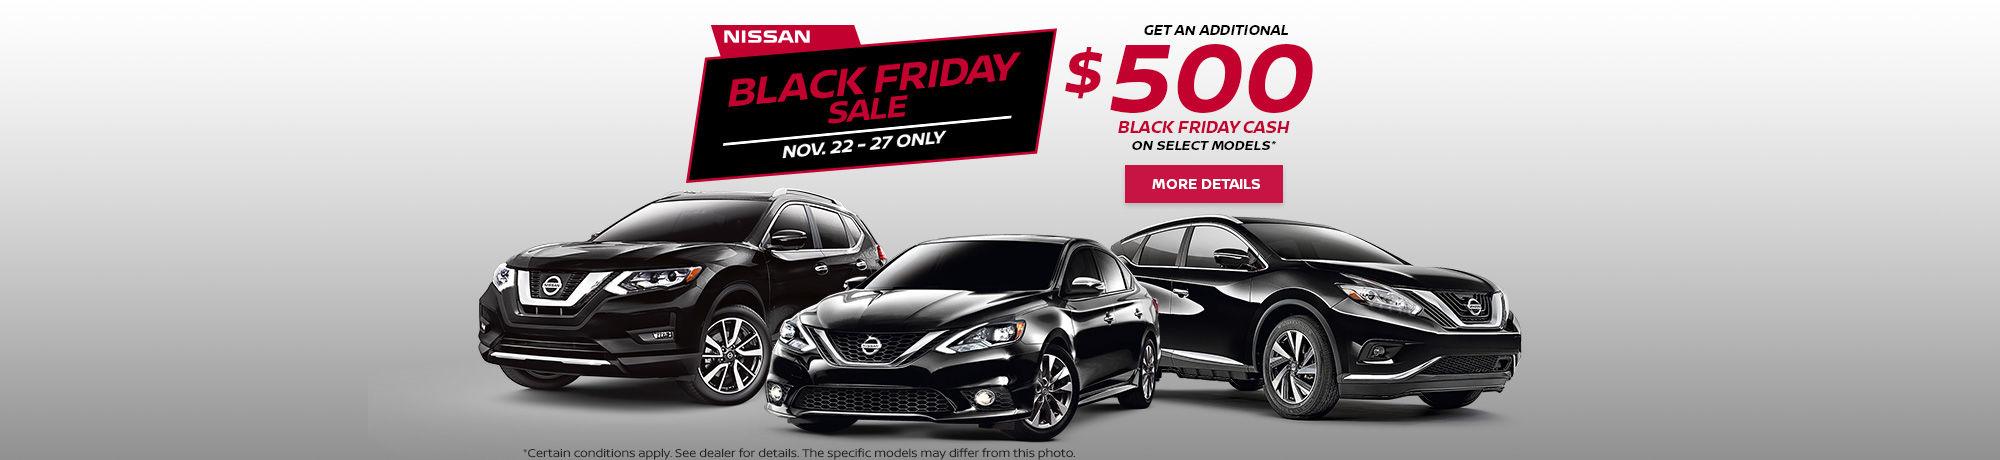 Black Friday Sale web